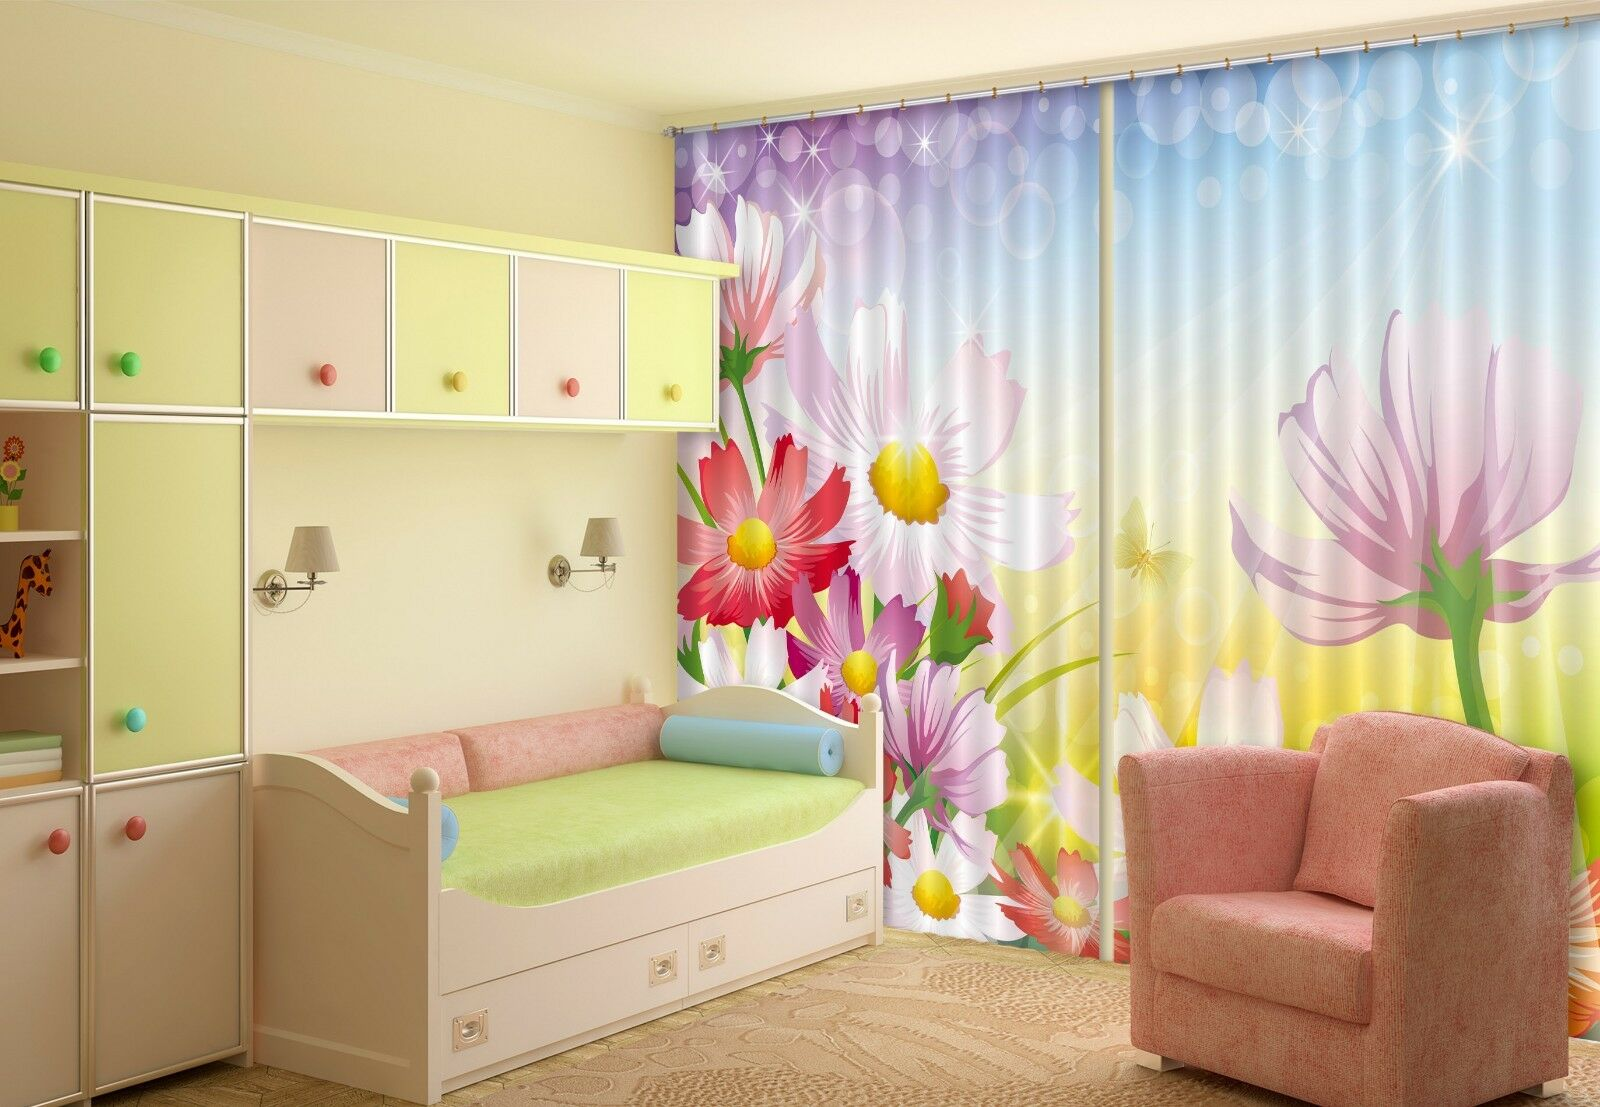 3D Flores 707 Cortinas de impresión de cortina de foto Blockout Tela Cortinas Ventana au